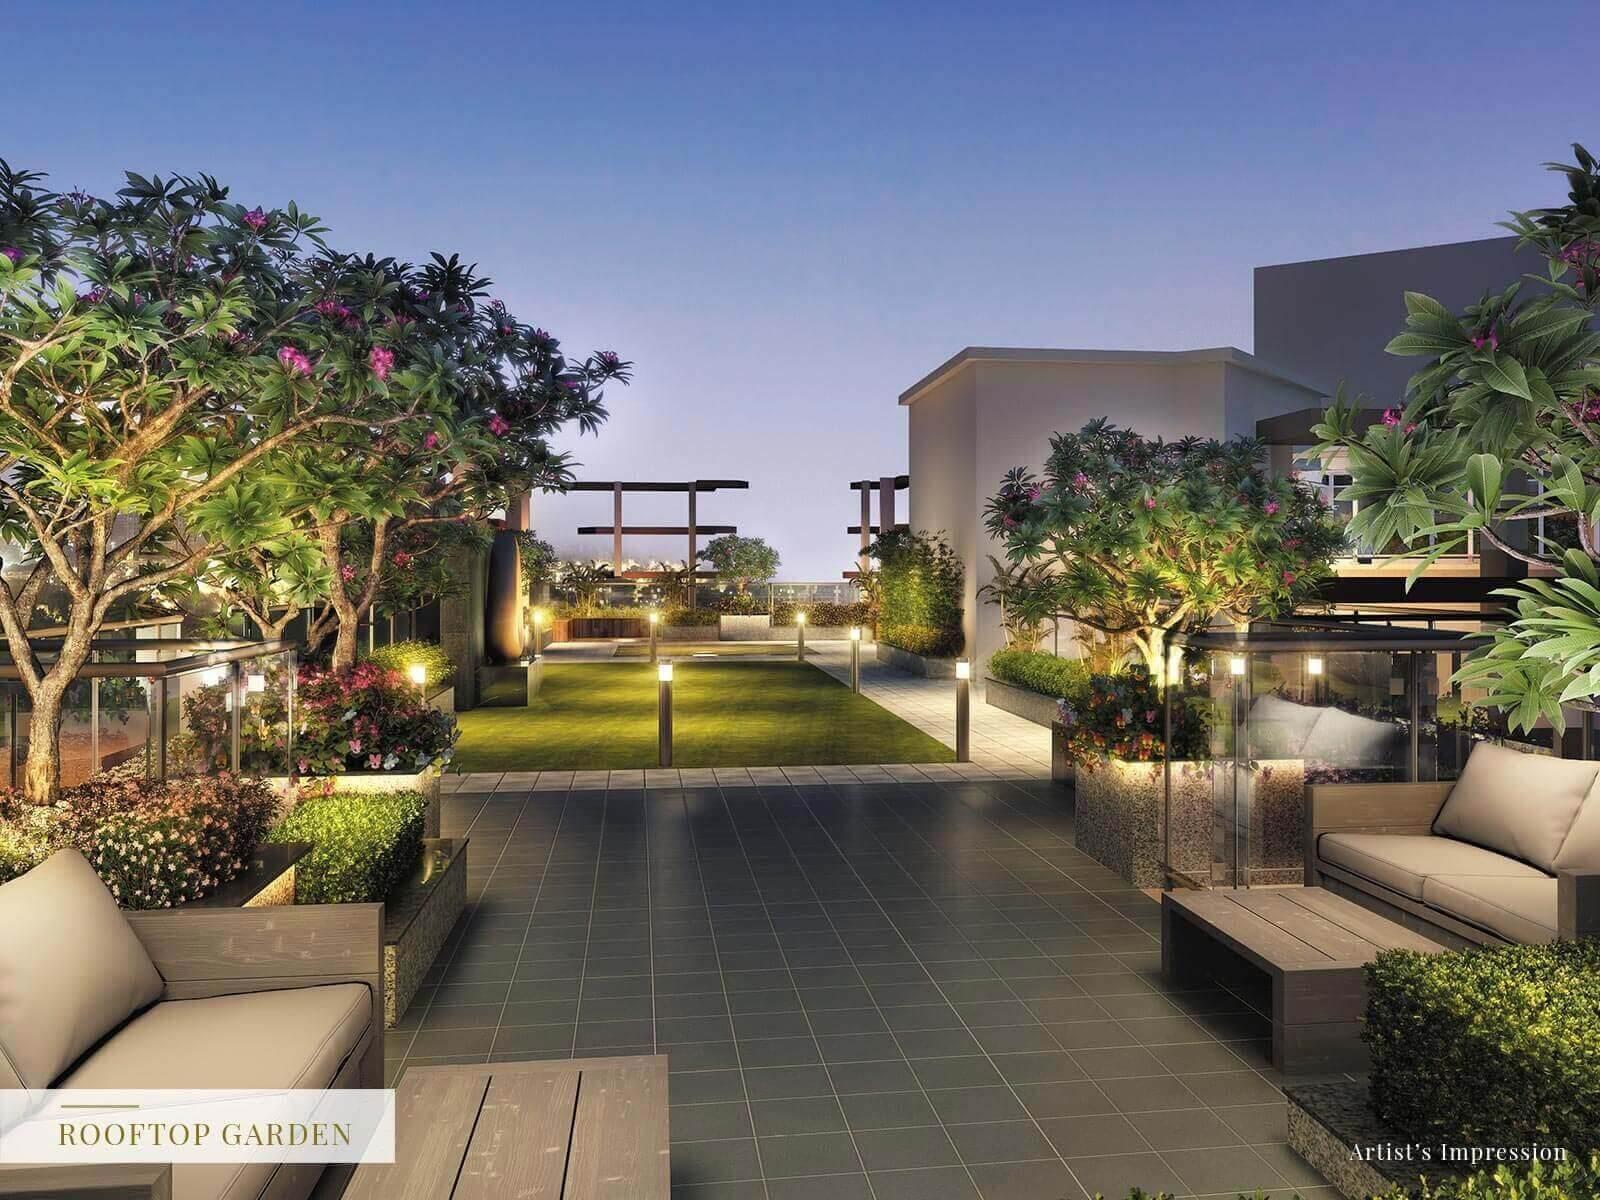 concrete sai samast amenities features3